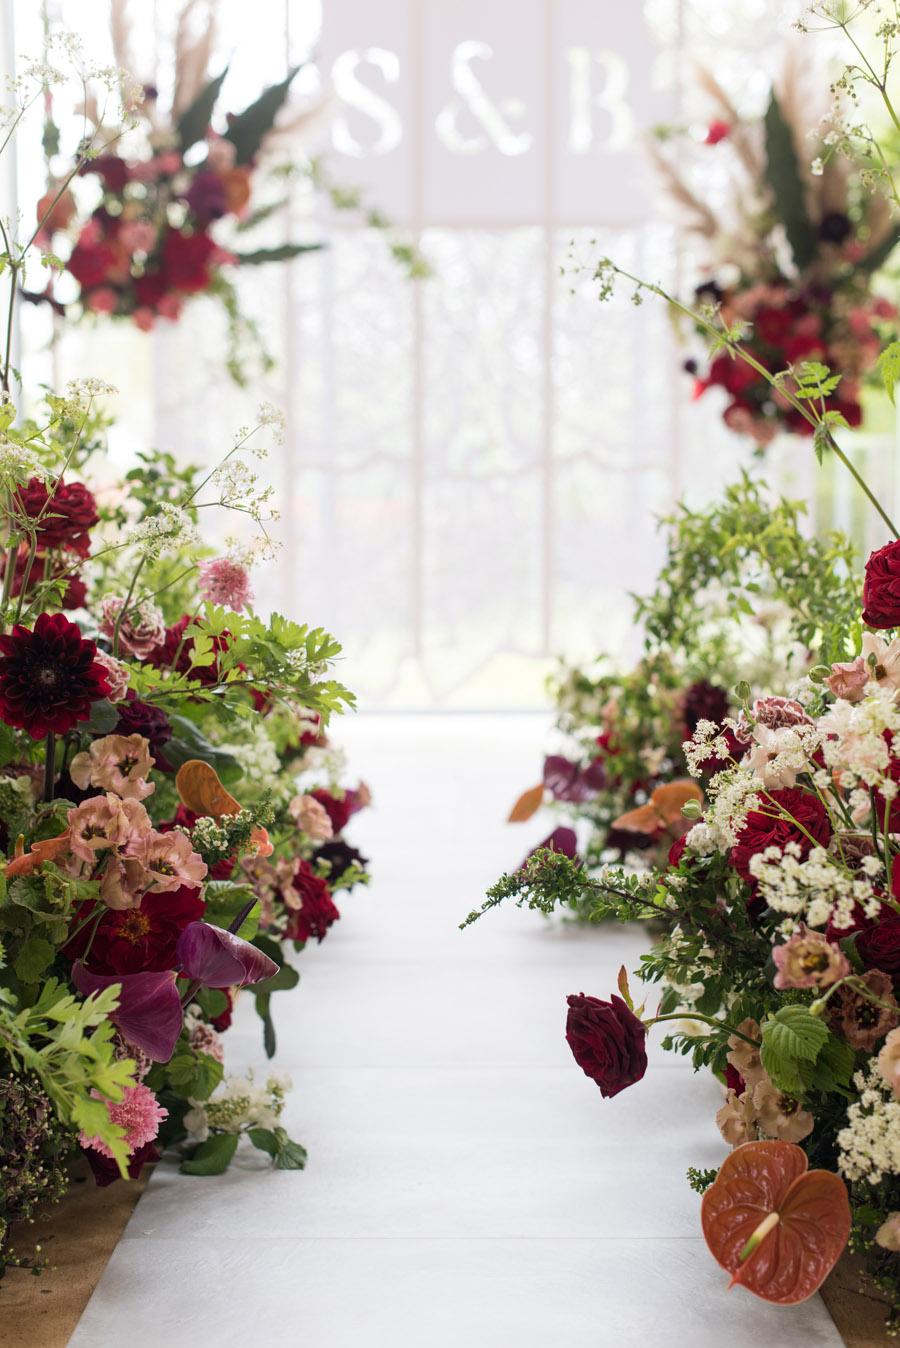 floral wedding ideas at Millbridge Court on English Wedding - photo credit Julie Michaelsen Photography (9)